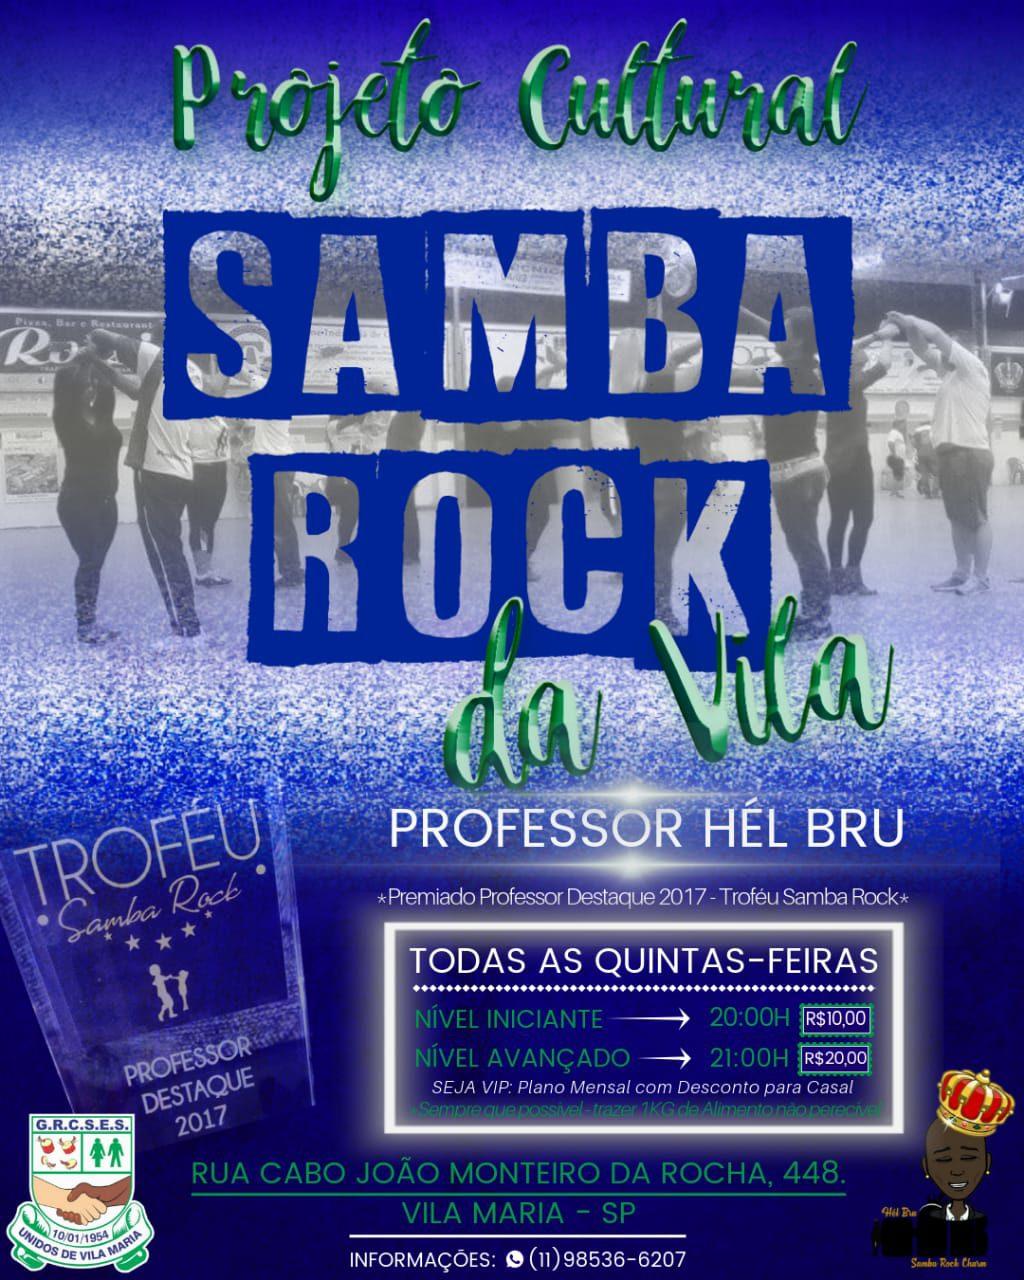 Todas as quintas tem aula de samba rock na zona norte pelo projeto Samba Rock da Vila #nota